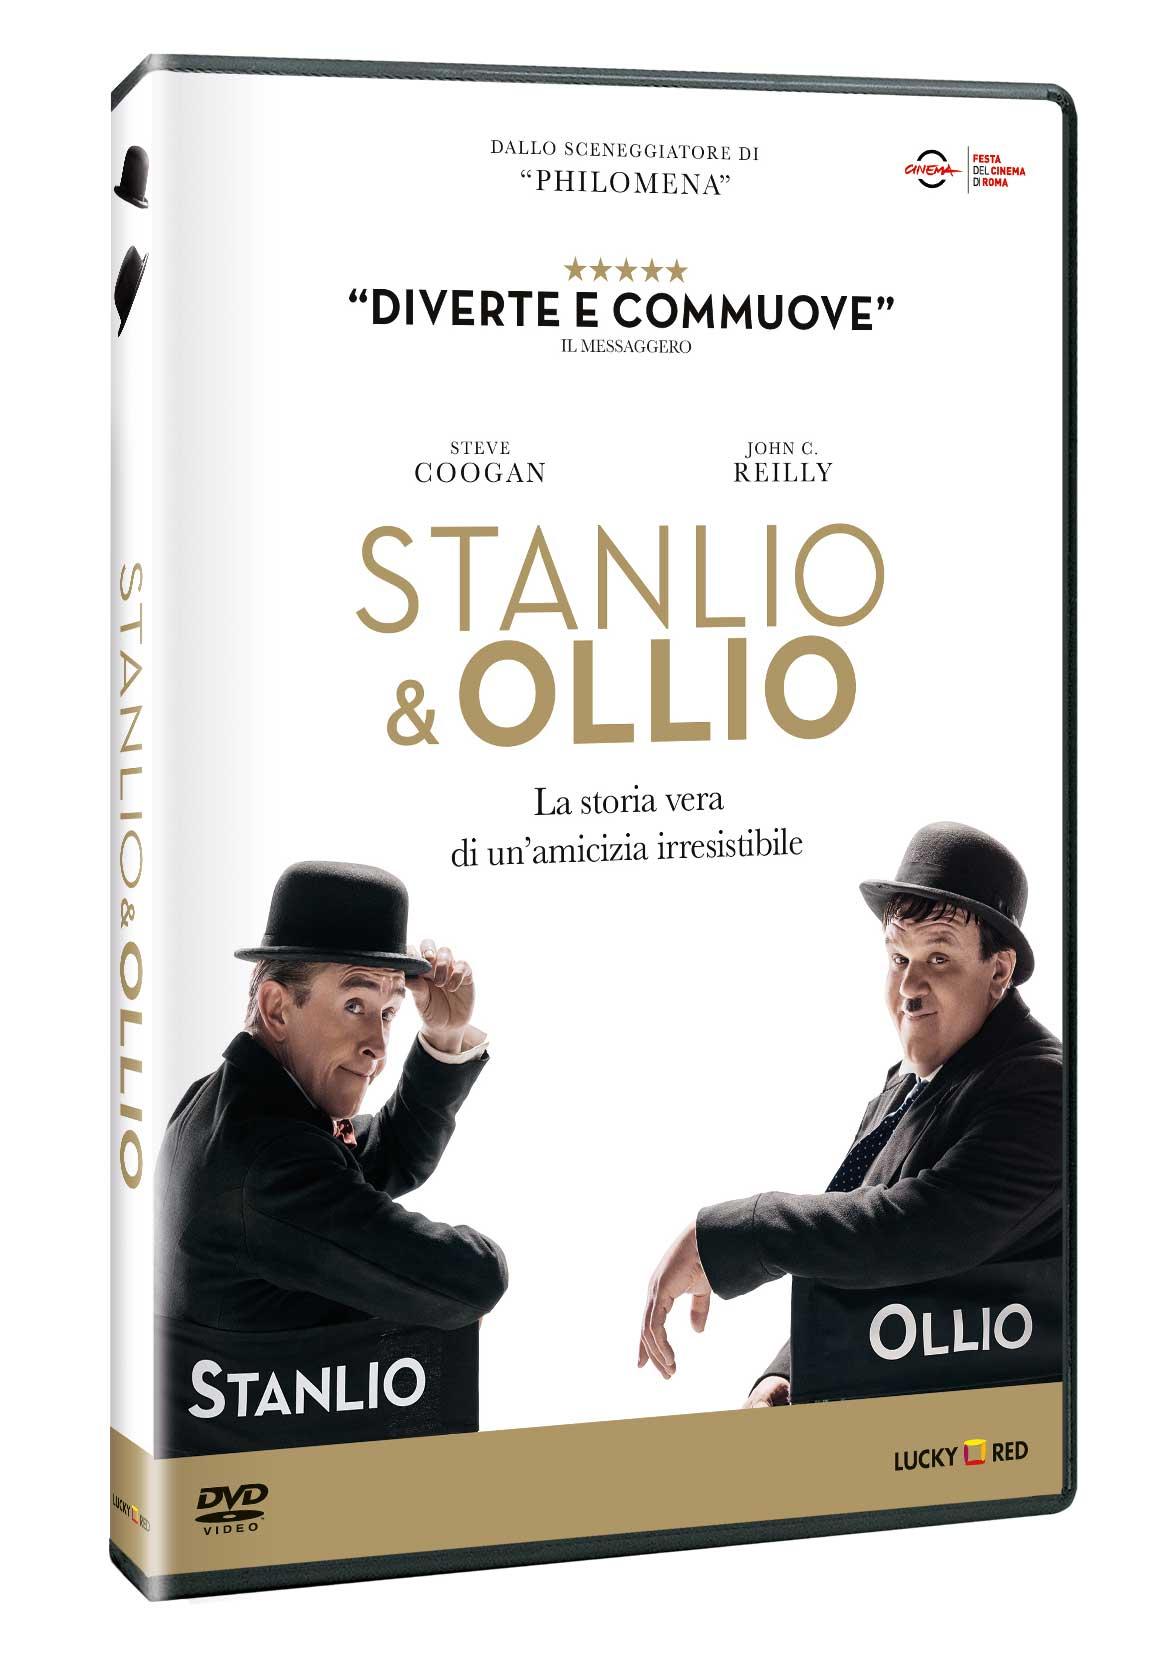 STANLIO E OLLIO - IL FILM - 2018 (DVD)